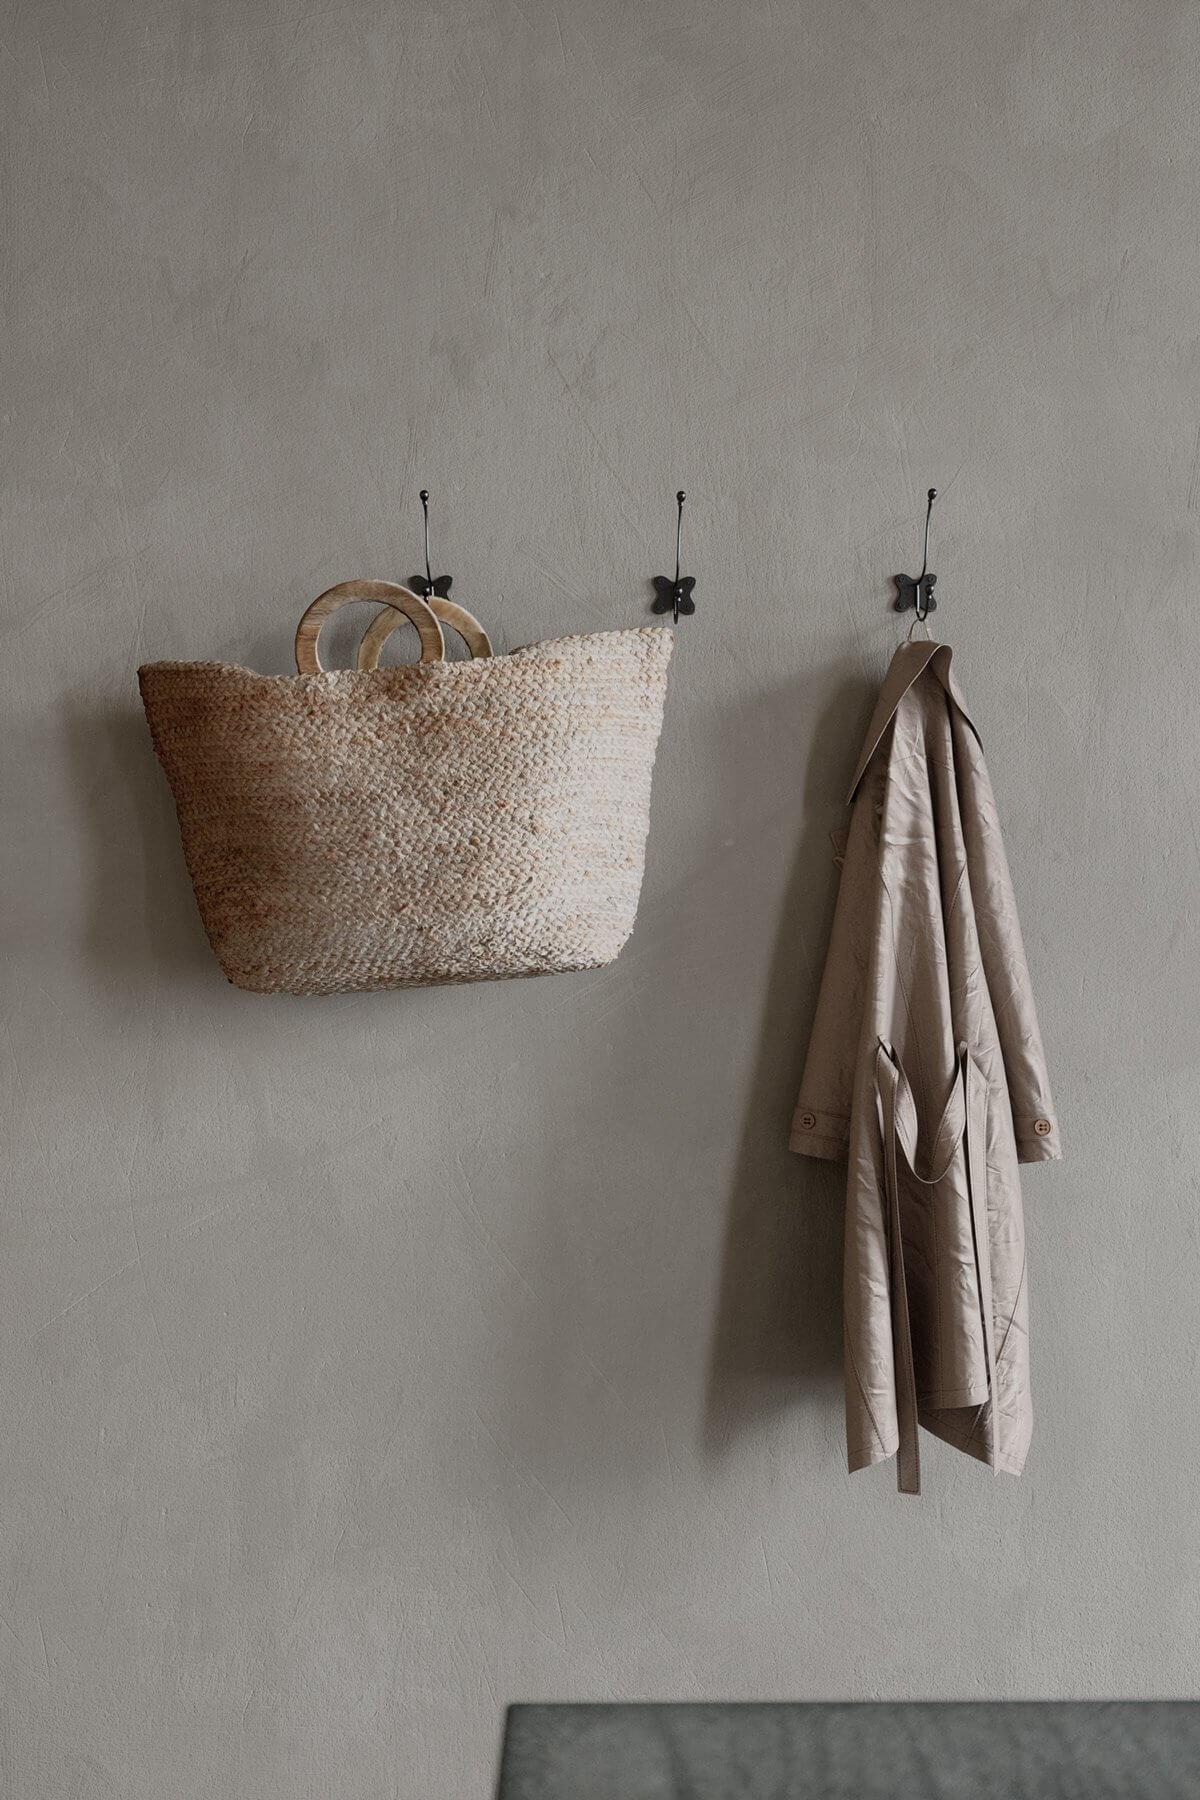 Studio Apartment in Berlin Kreuzberg-living-room-hanger-basket